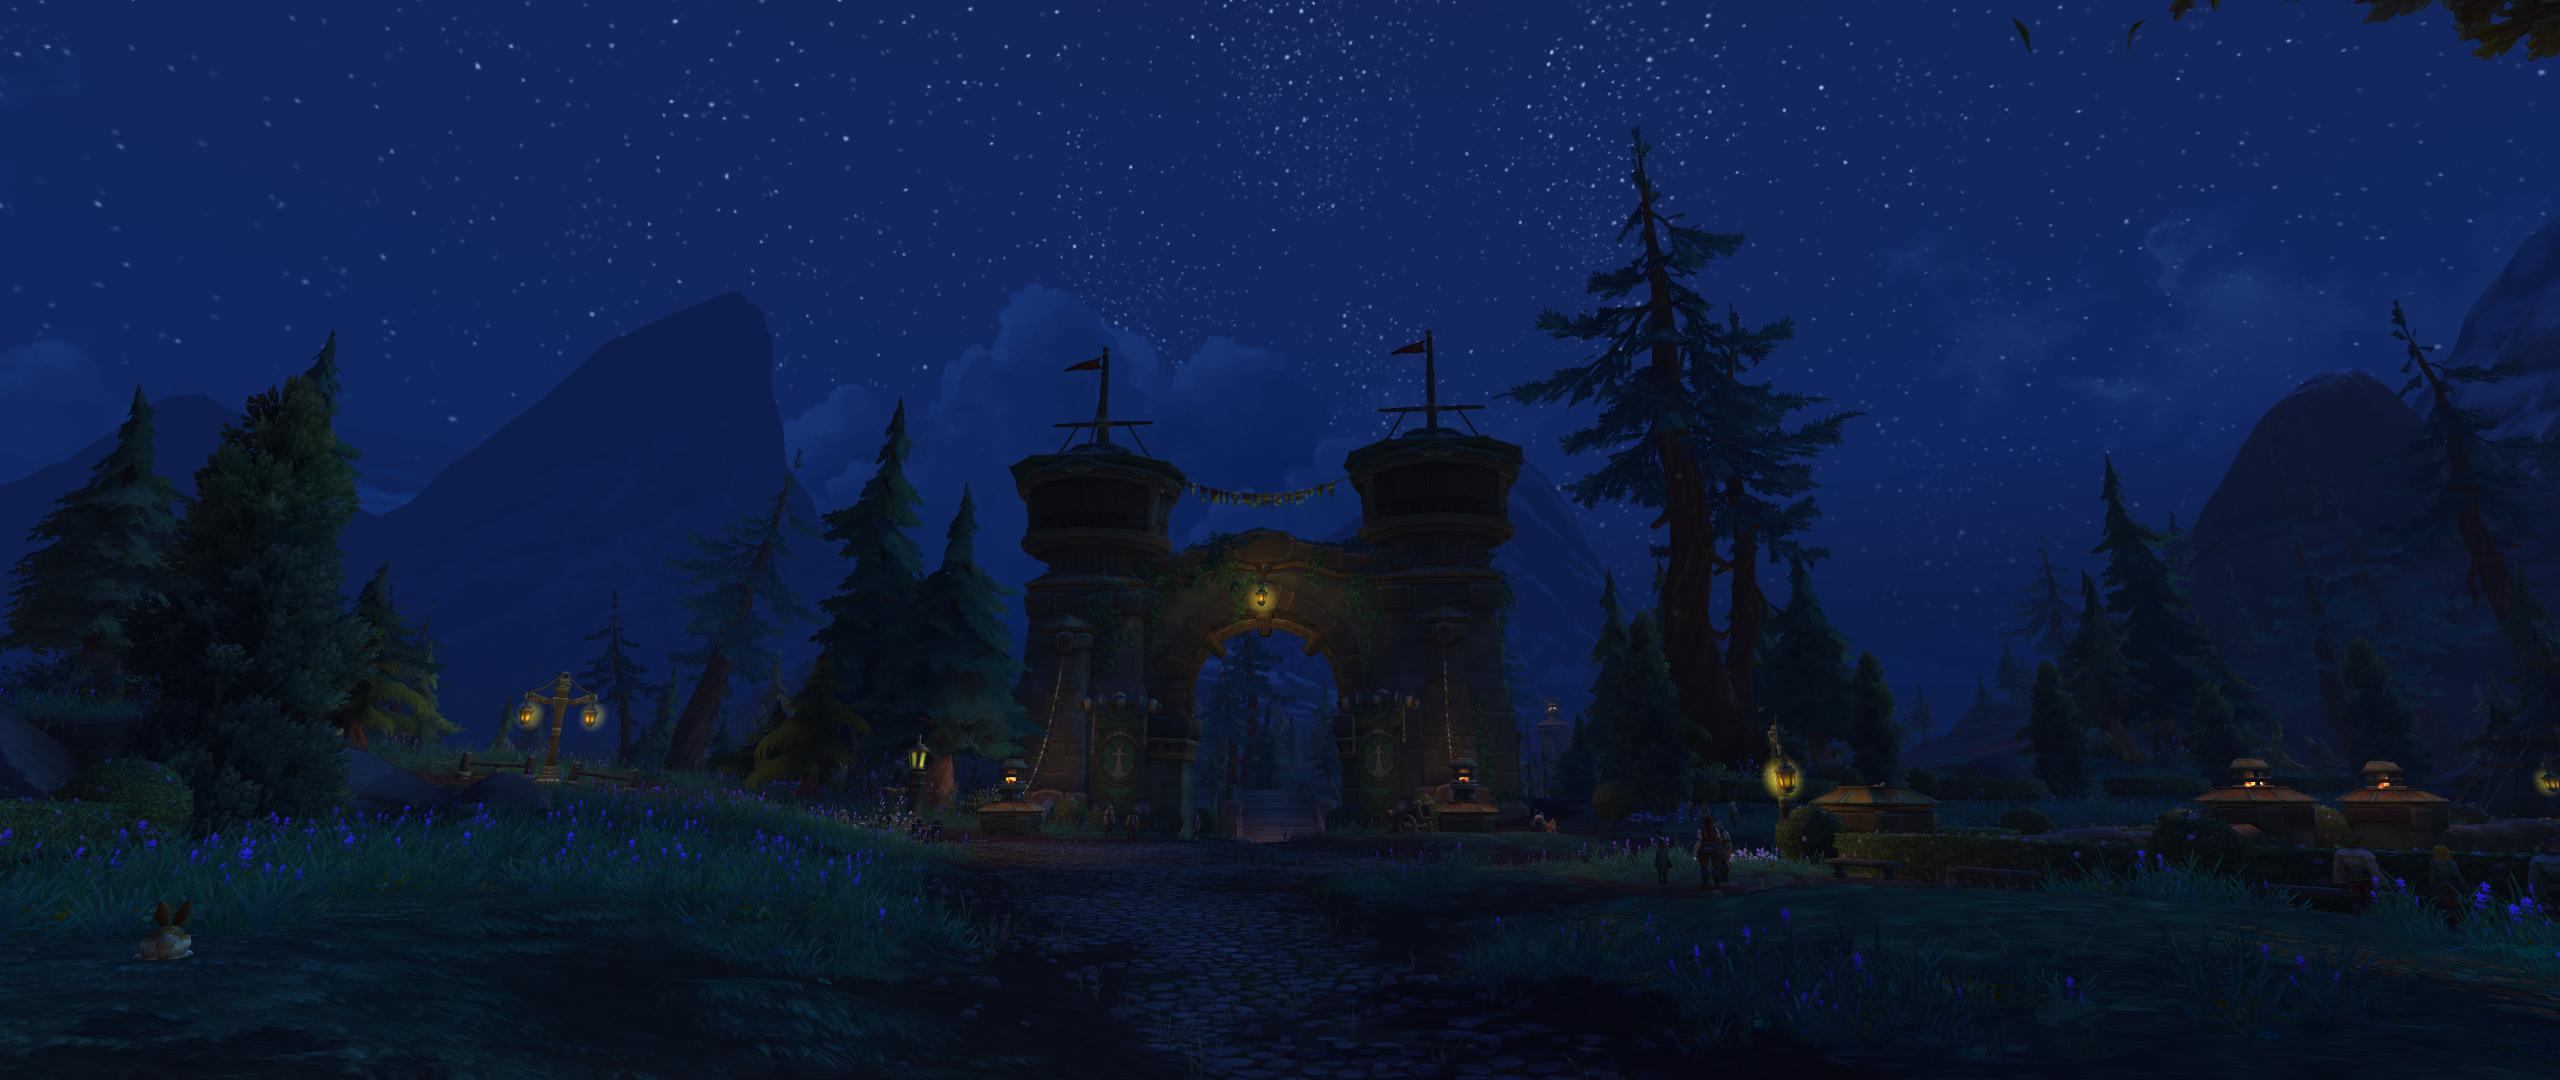 World Of Warcraft Screenshot 2018.08.21 - 02.58.33.73.png - World of Warcraft